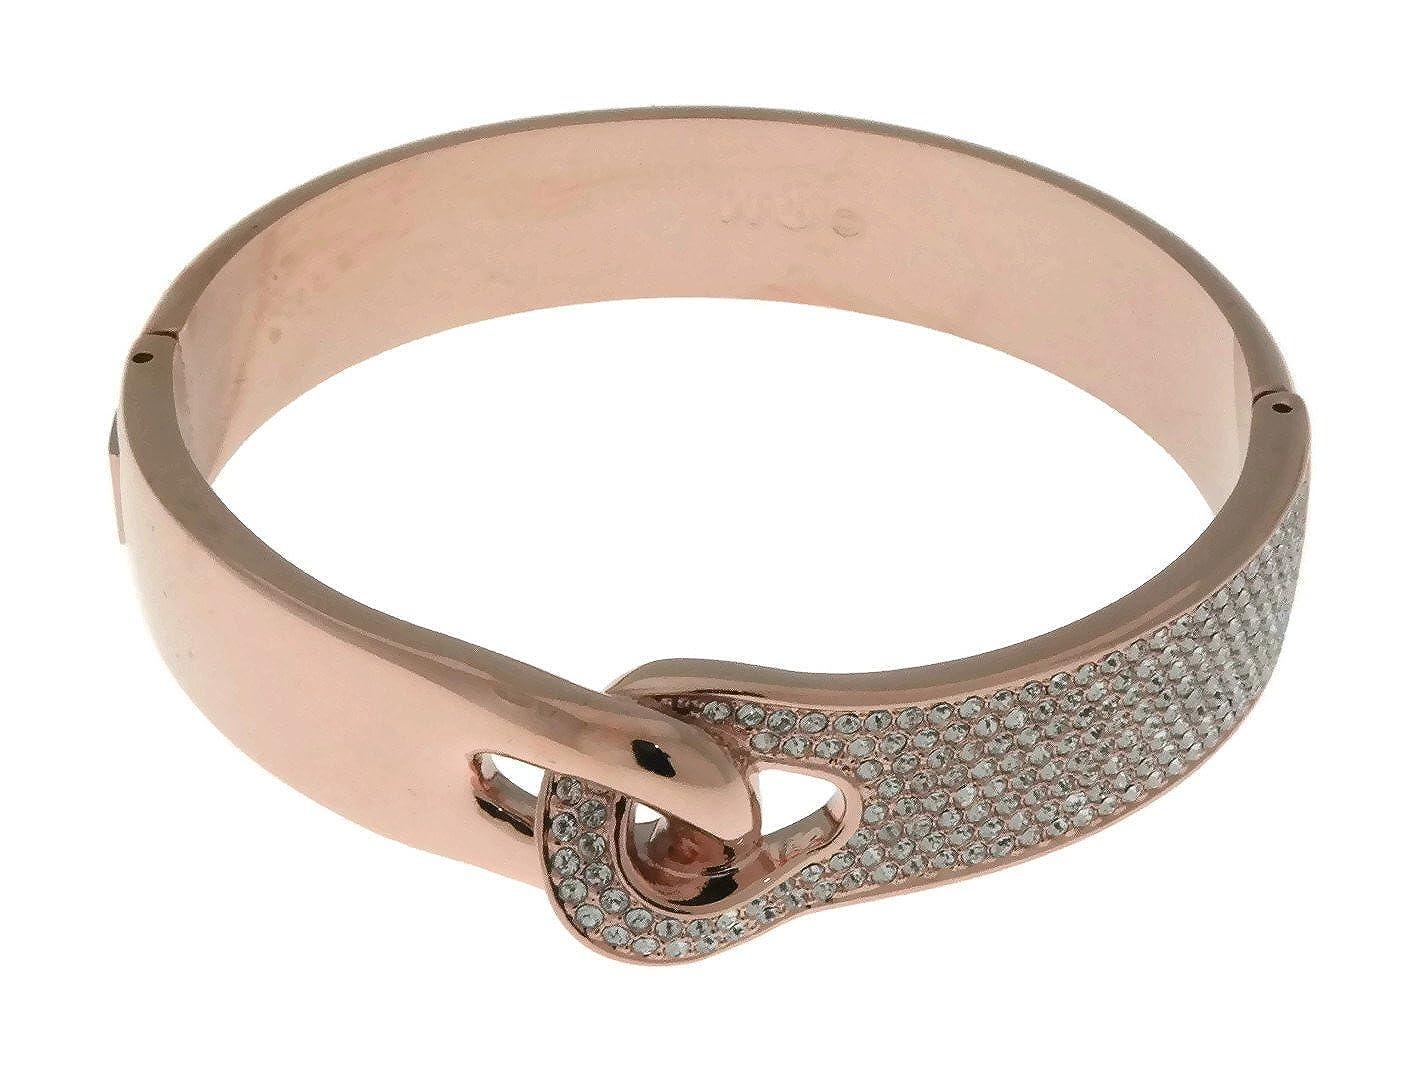 56523da09797f Amazon.com: Swarovski Gallon Wide Bangle - White - 5252876: Jewelry